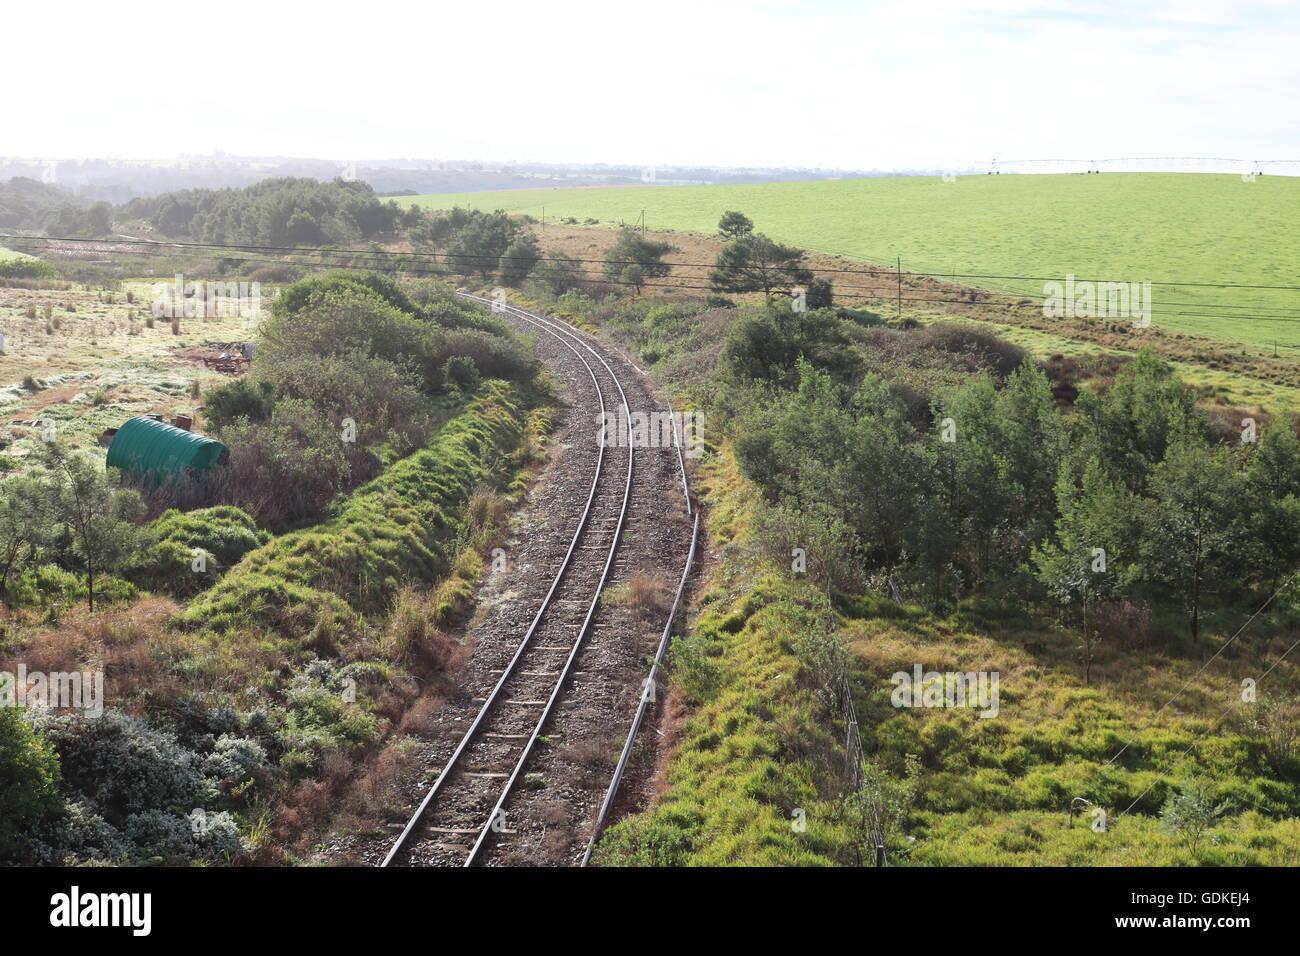 railway tracks countryside trains locomotives - Stock Image